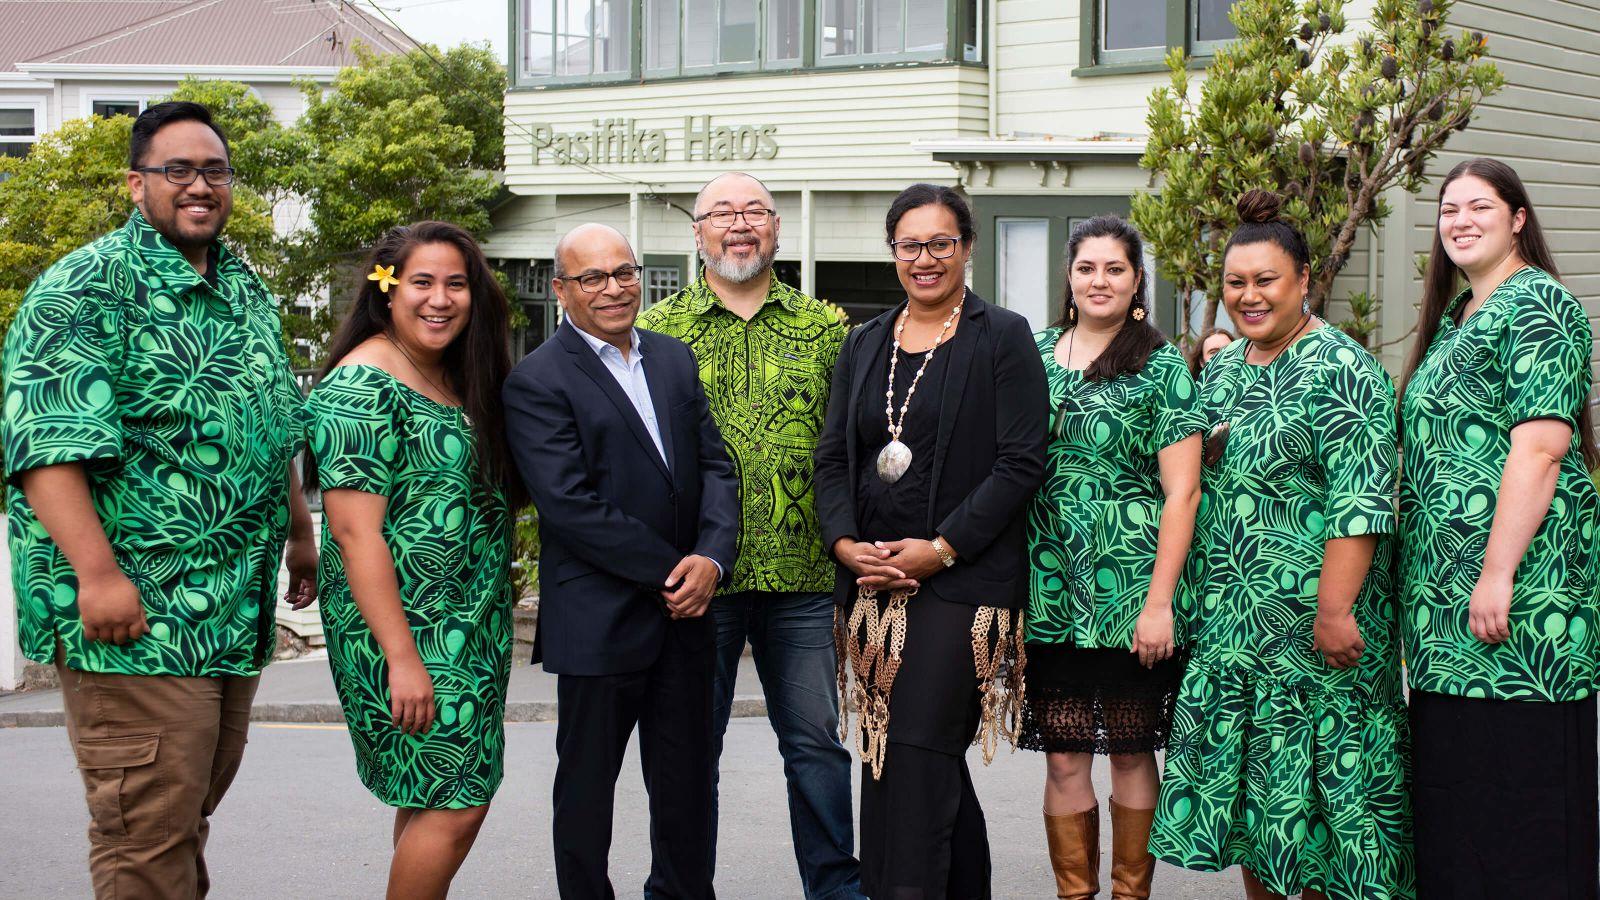 Pasifika Student Success team, in front of the Pasifika Haos on Mount Street